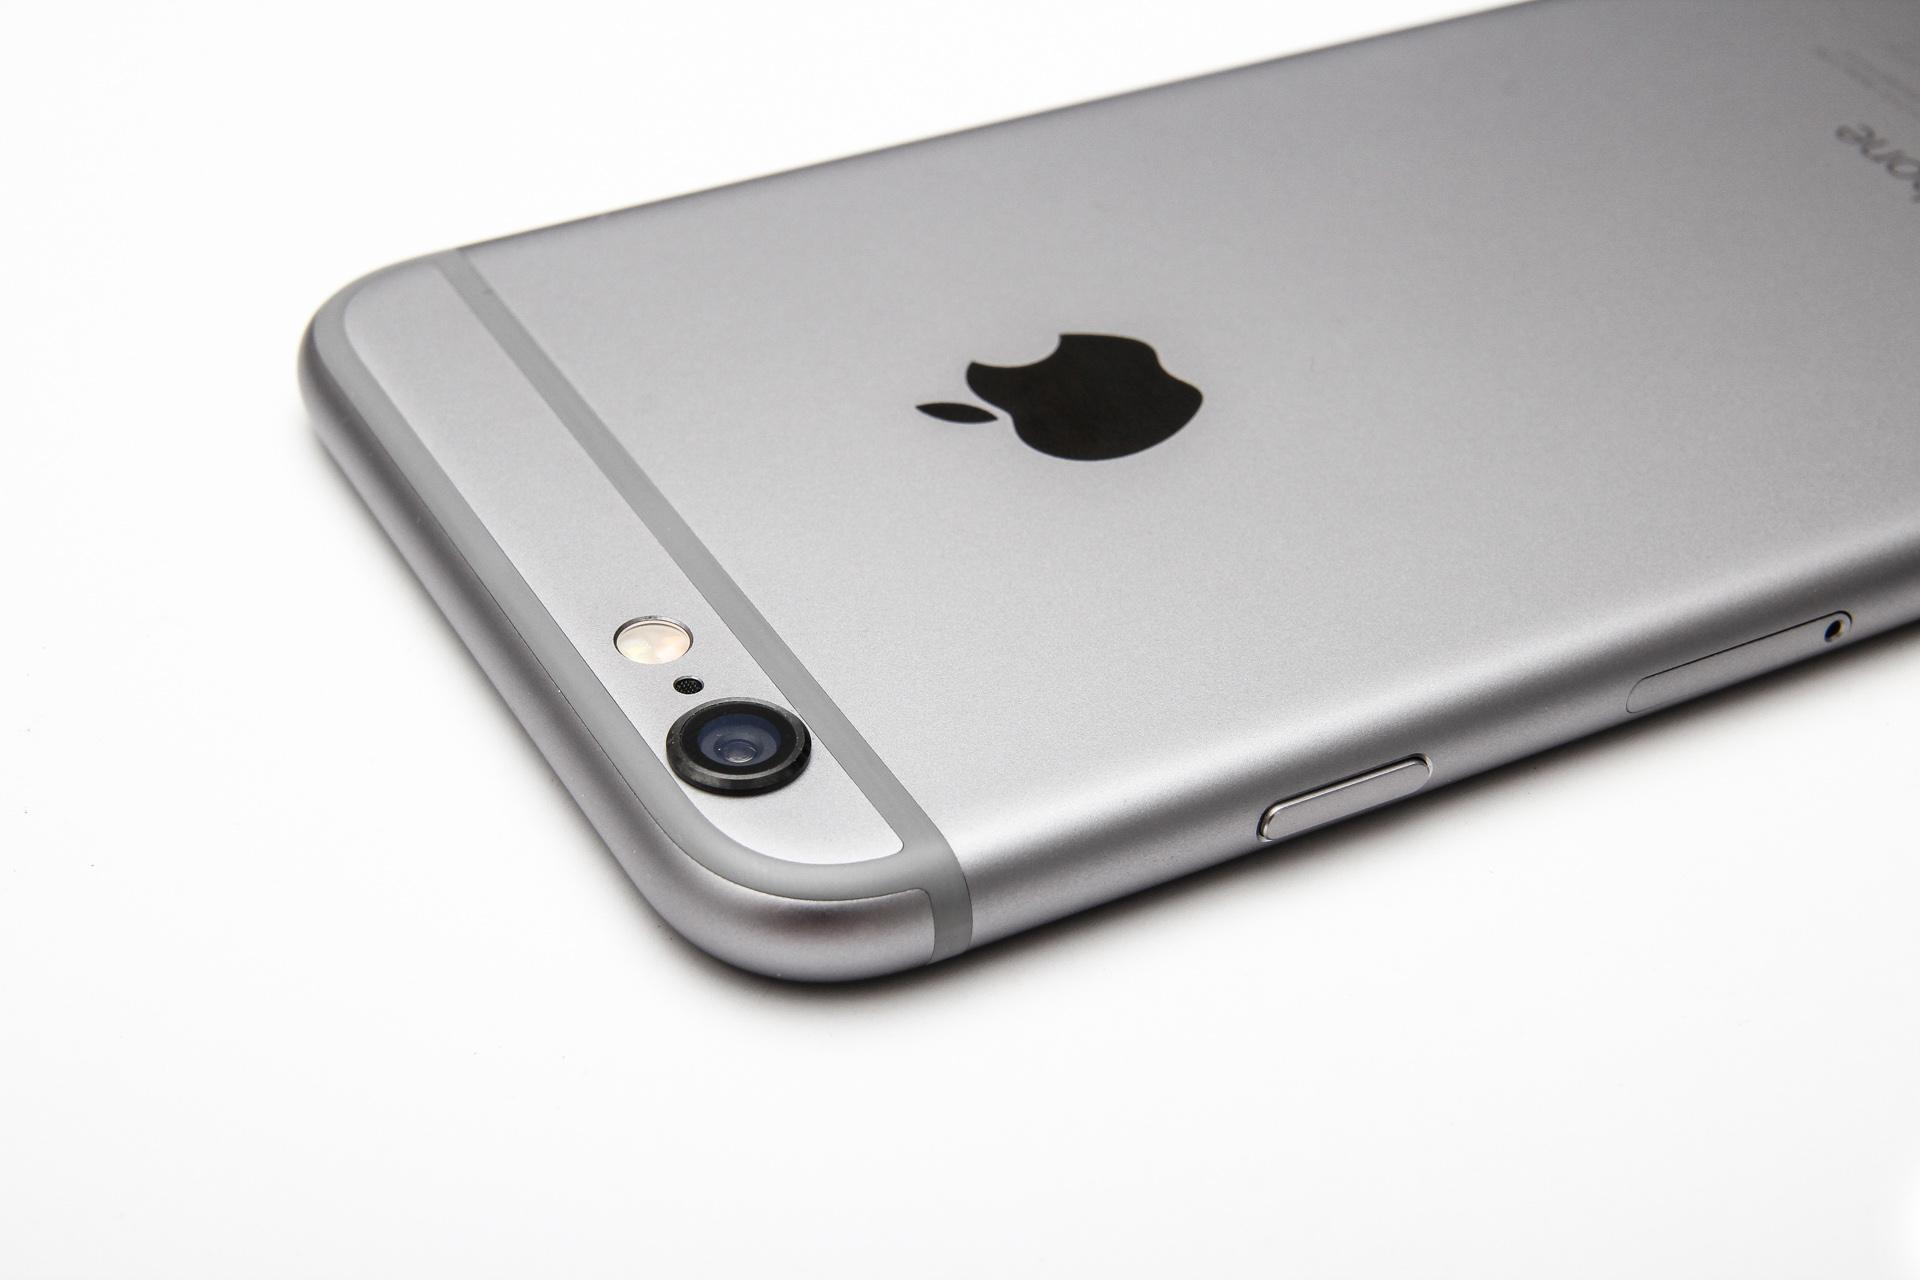 Refurbished Apple Iphone 6 64gb Original Grey Colour Digitalzone2u 6s Gold Silver Dg2u